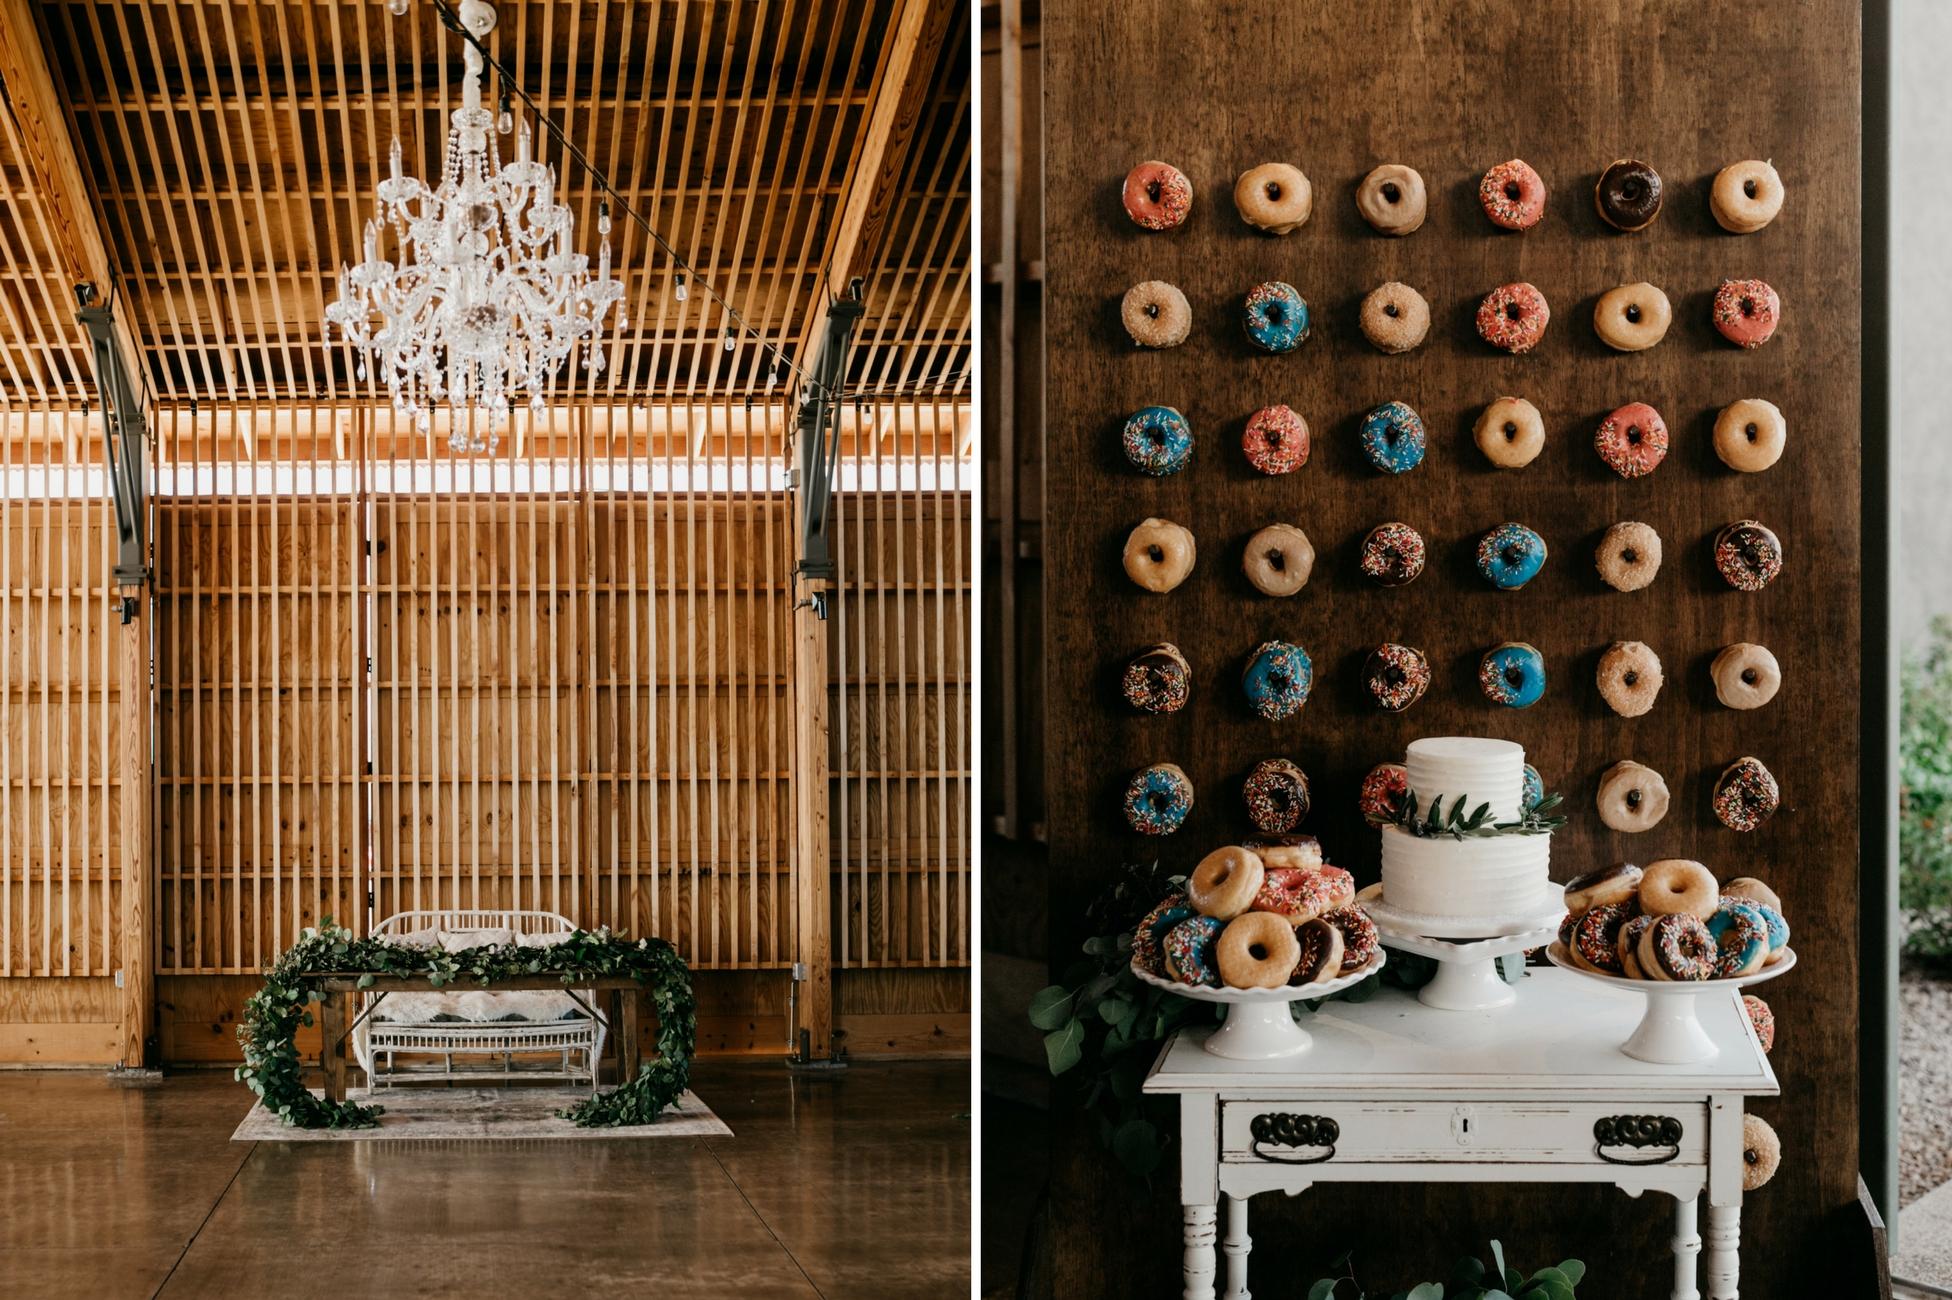 Tremaine Ranch - AZ Arizona Wedding & Event, Vintage, Furniture, Tableware, & Specialty Rentals in Phoenix, Tucson, Flagstaff, Sedona, Tempe, Chandler, Mesa, Gilbert, Prescott, Payson 51.jpg